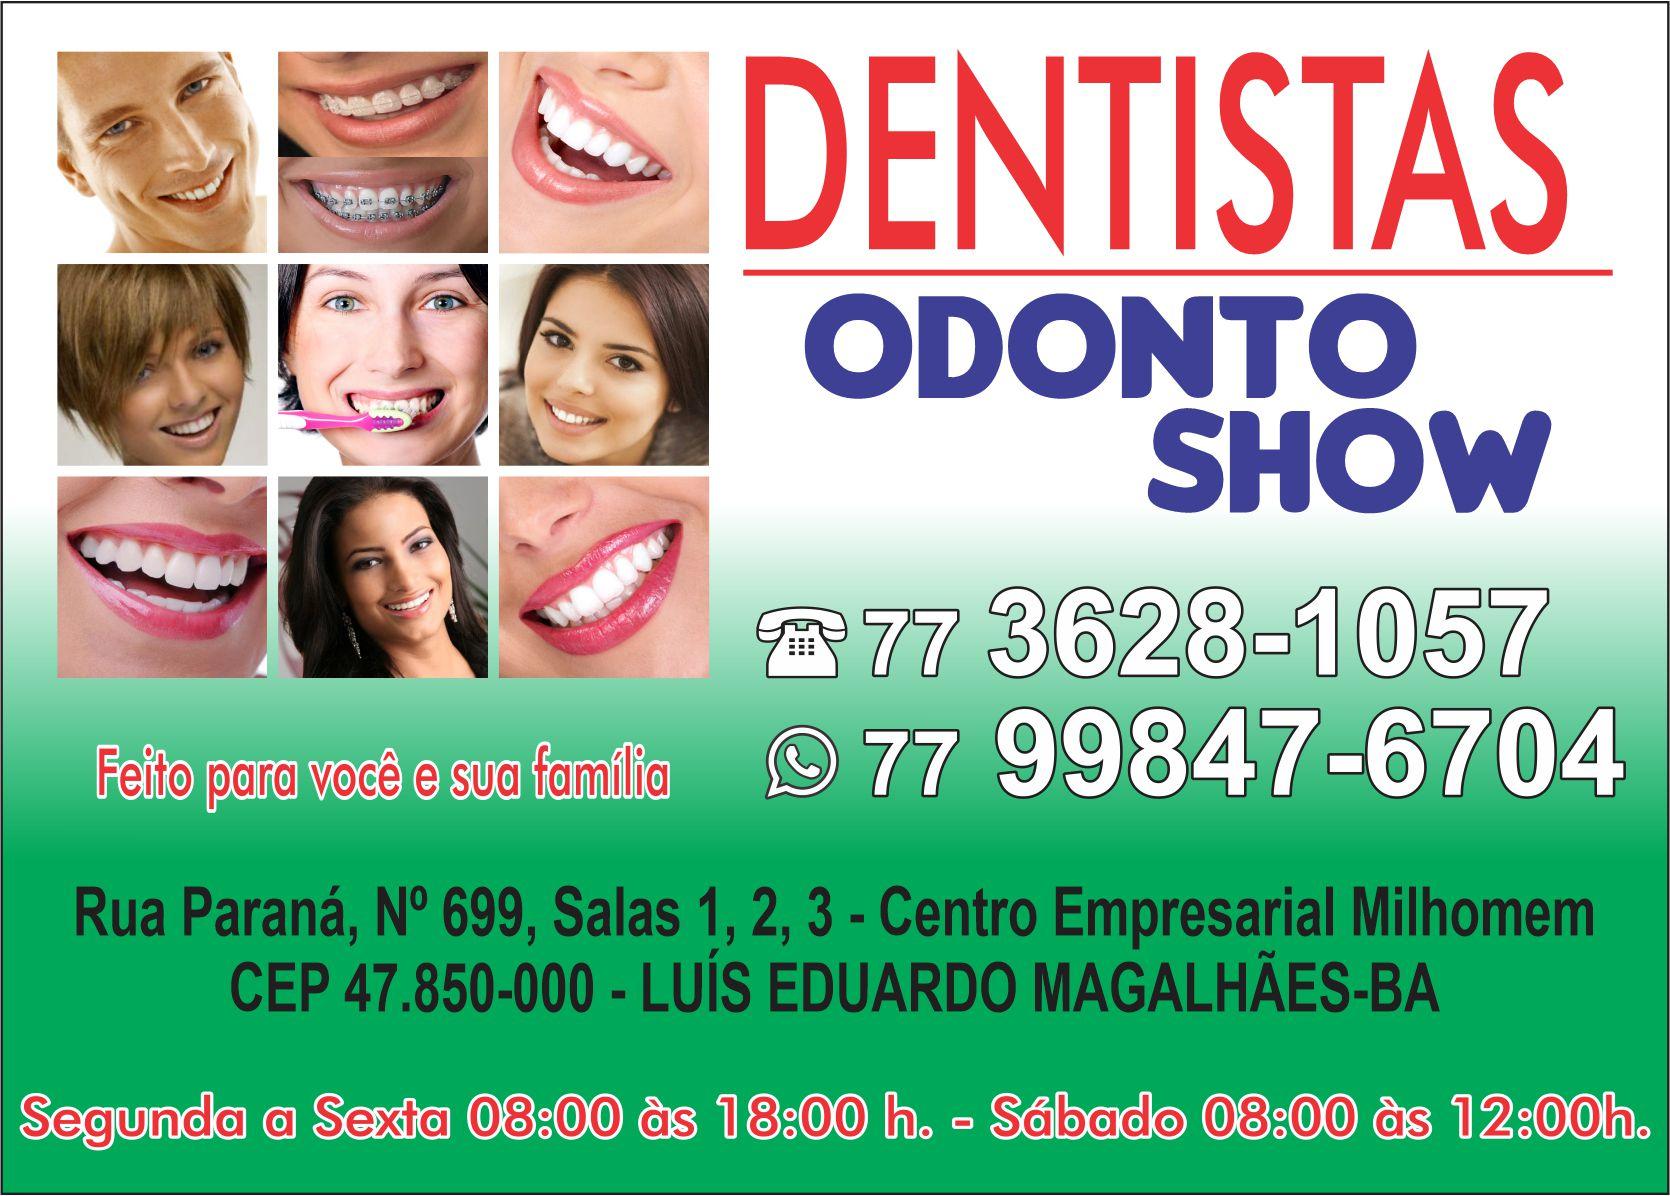 odonto show banner